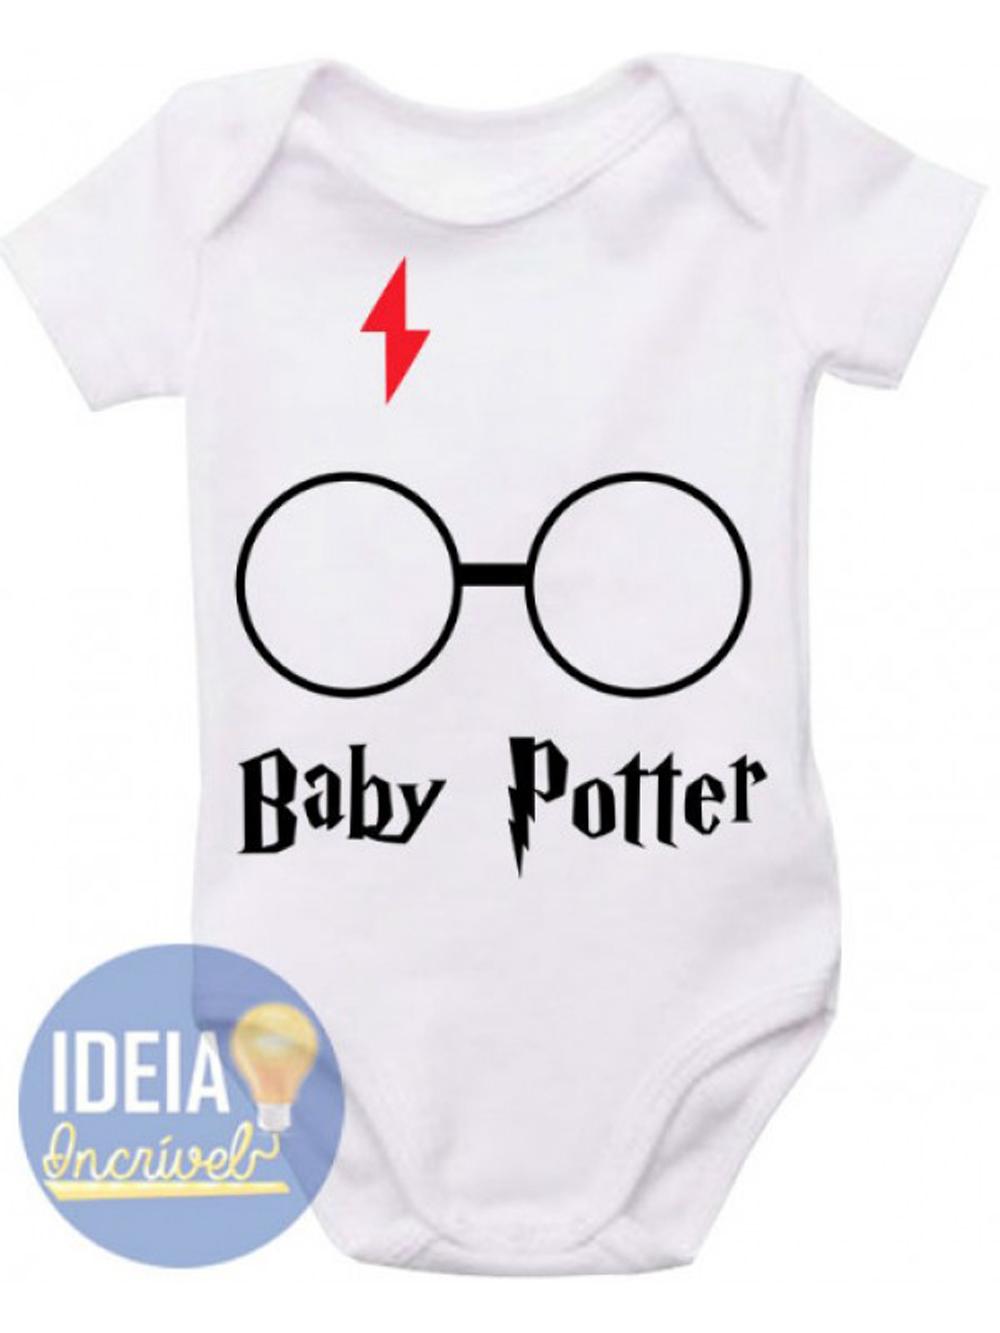 eb14bae9d Roupas Harry Potter para Bebe   Elo7